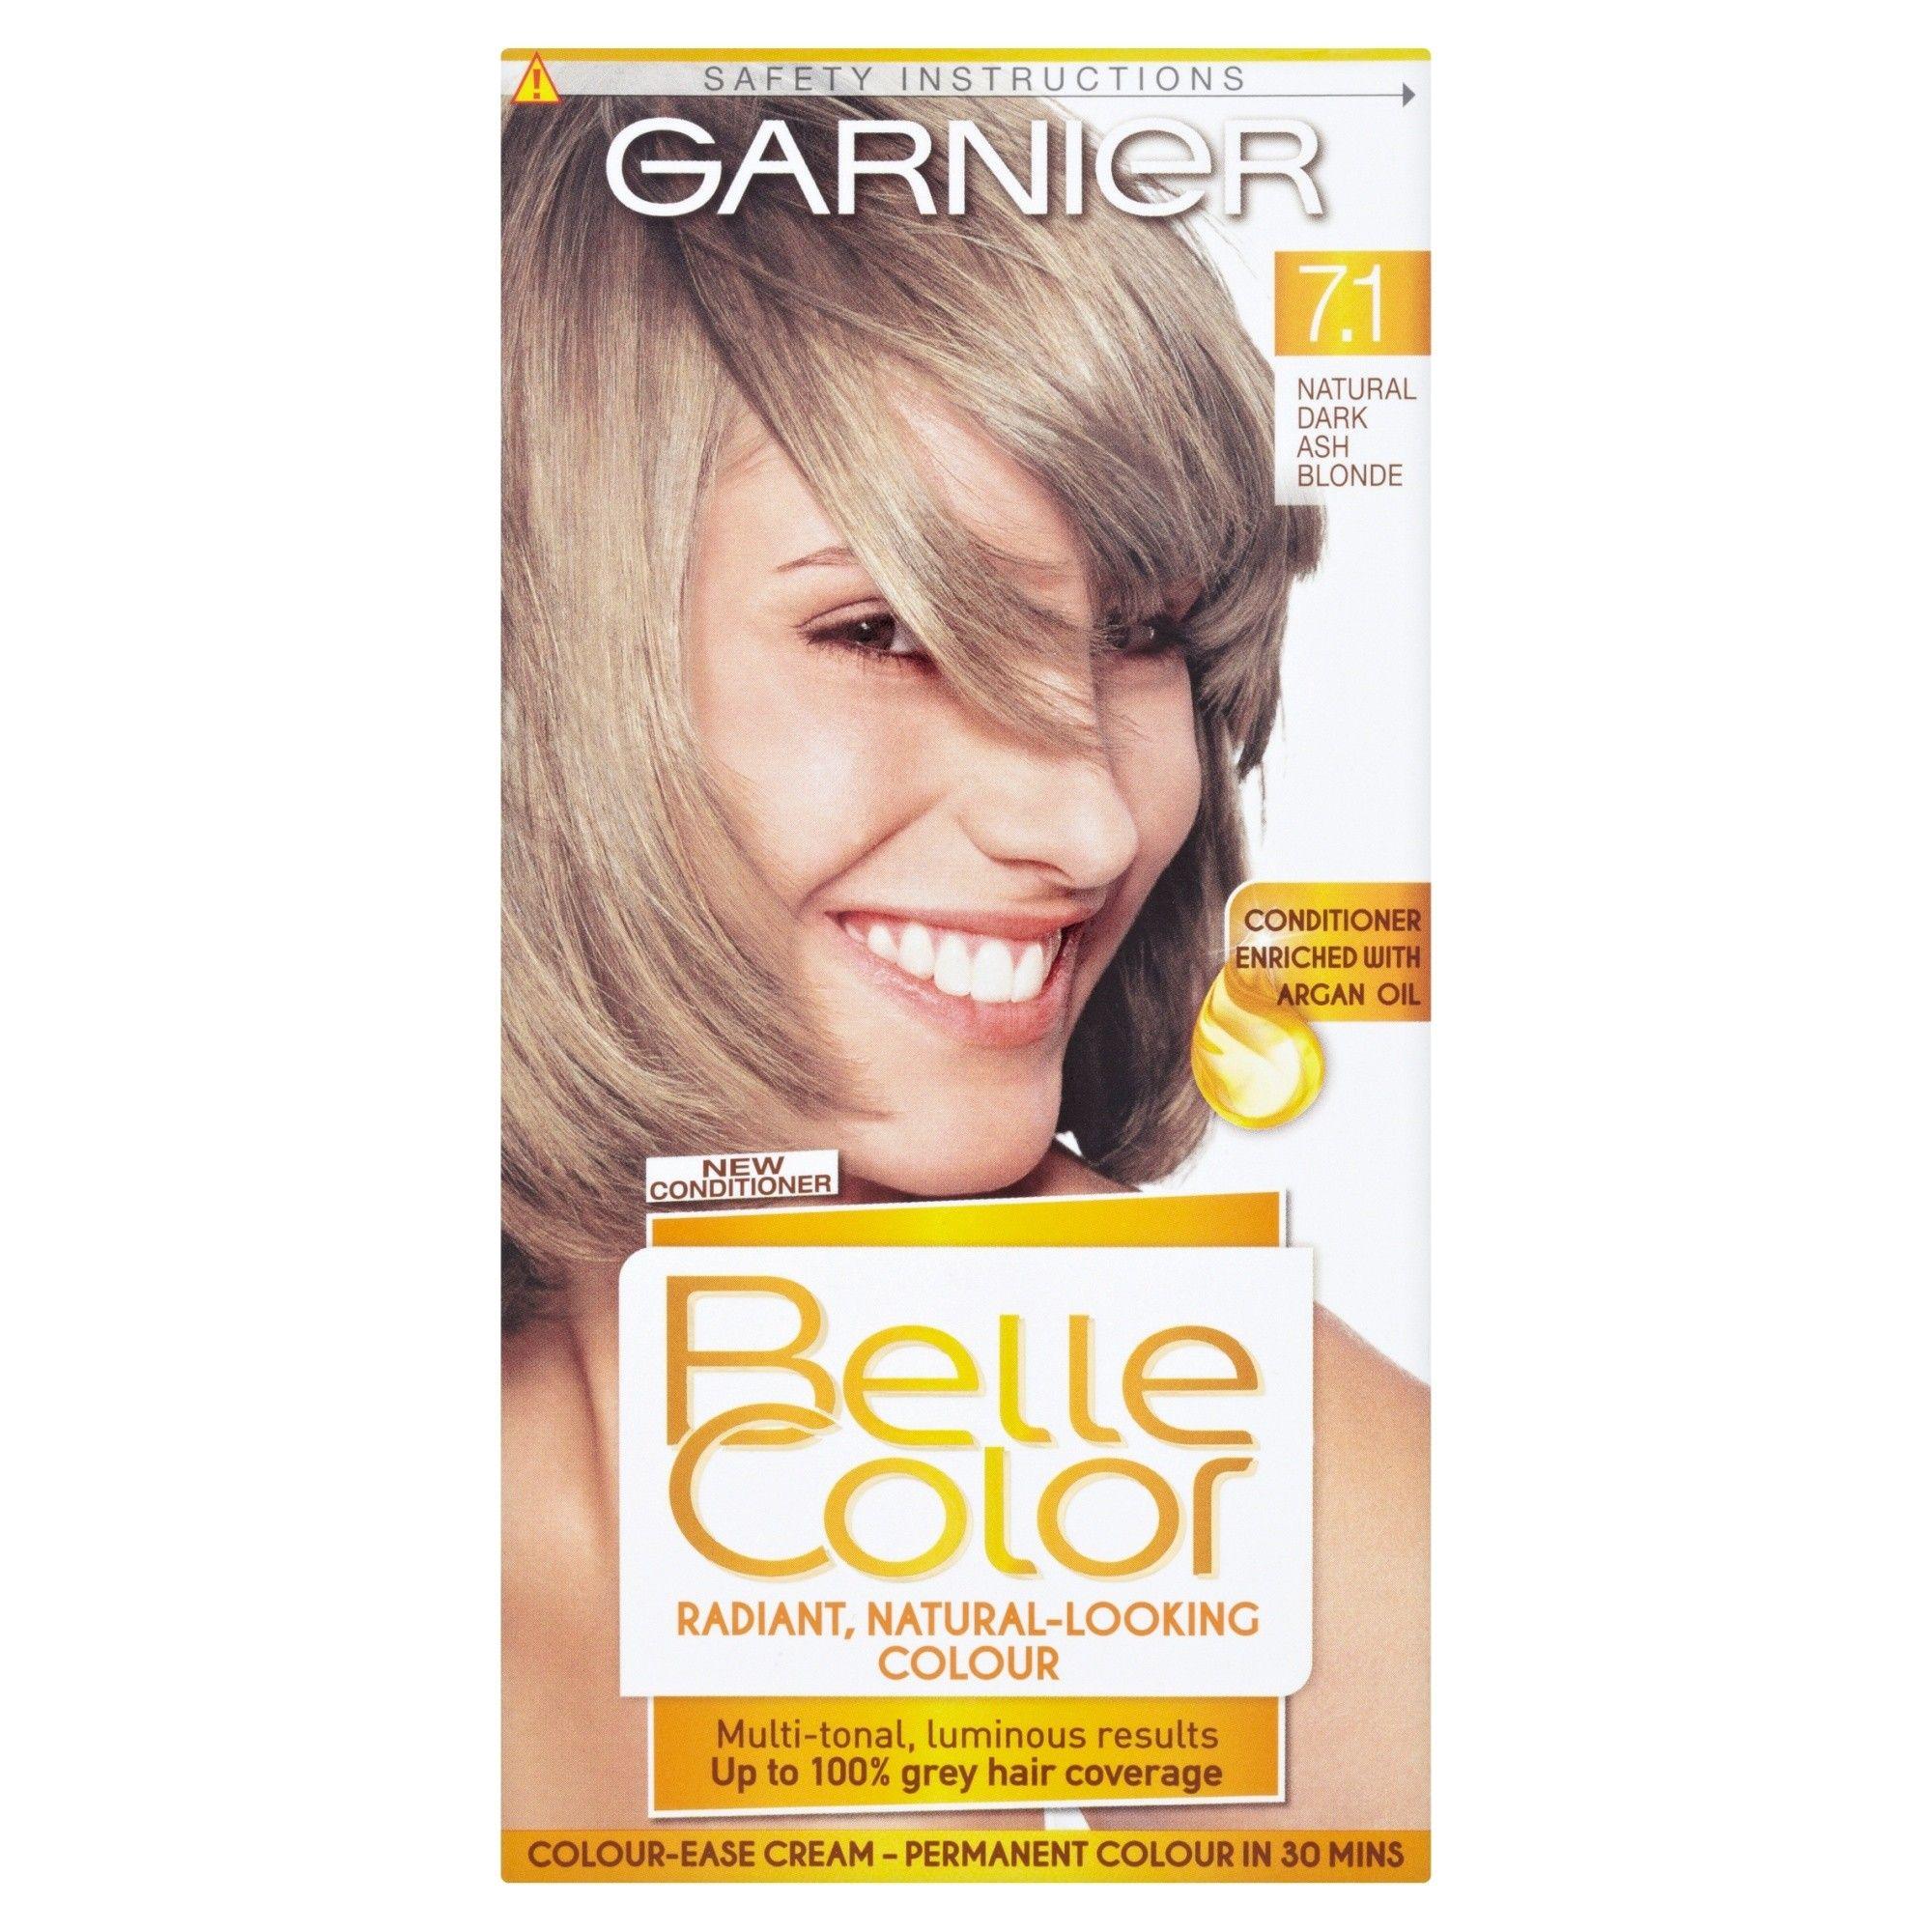 Garnier Belle Colour 7 1 Natural Dark Ash Blonde Hair Dye In 2020